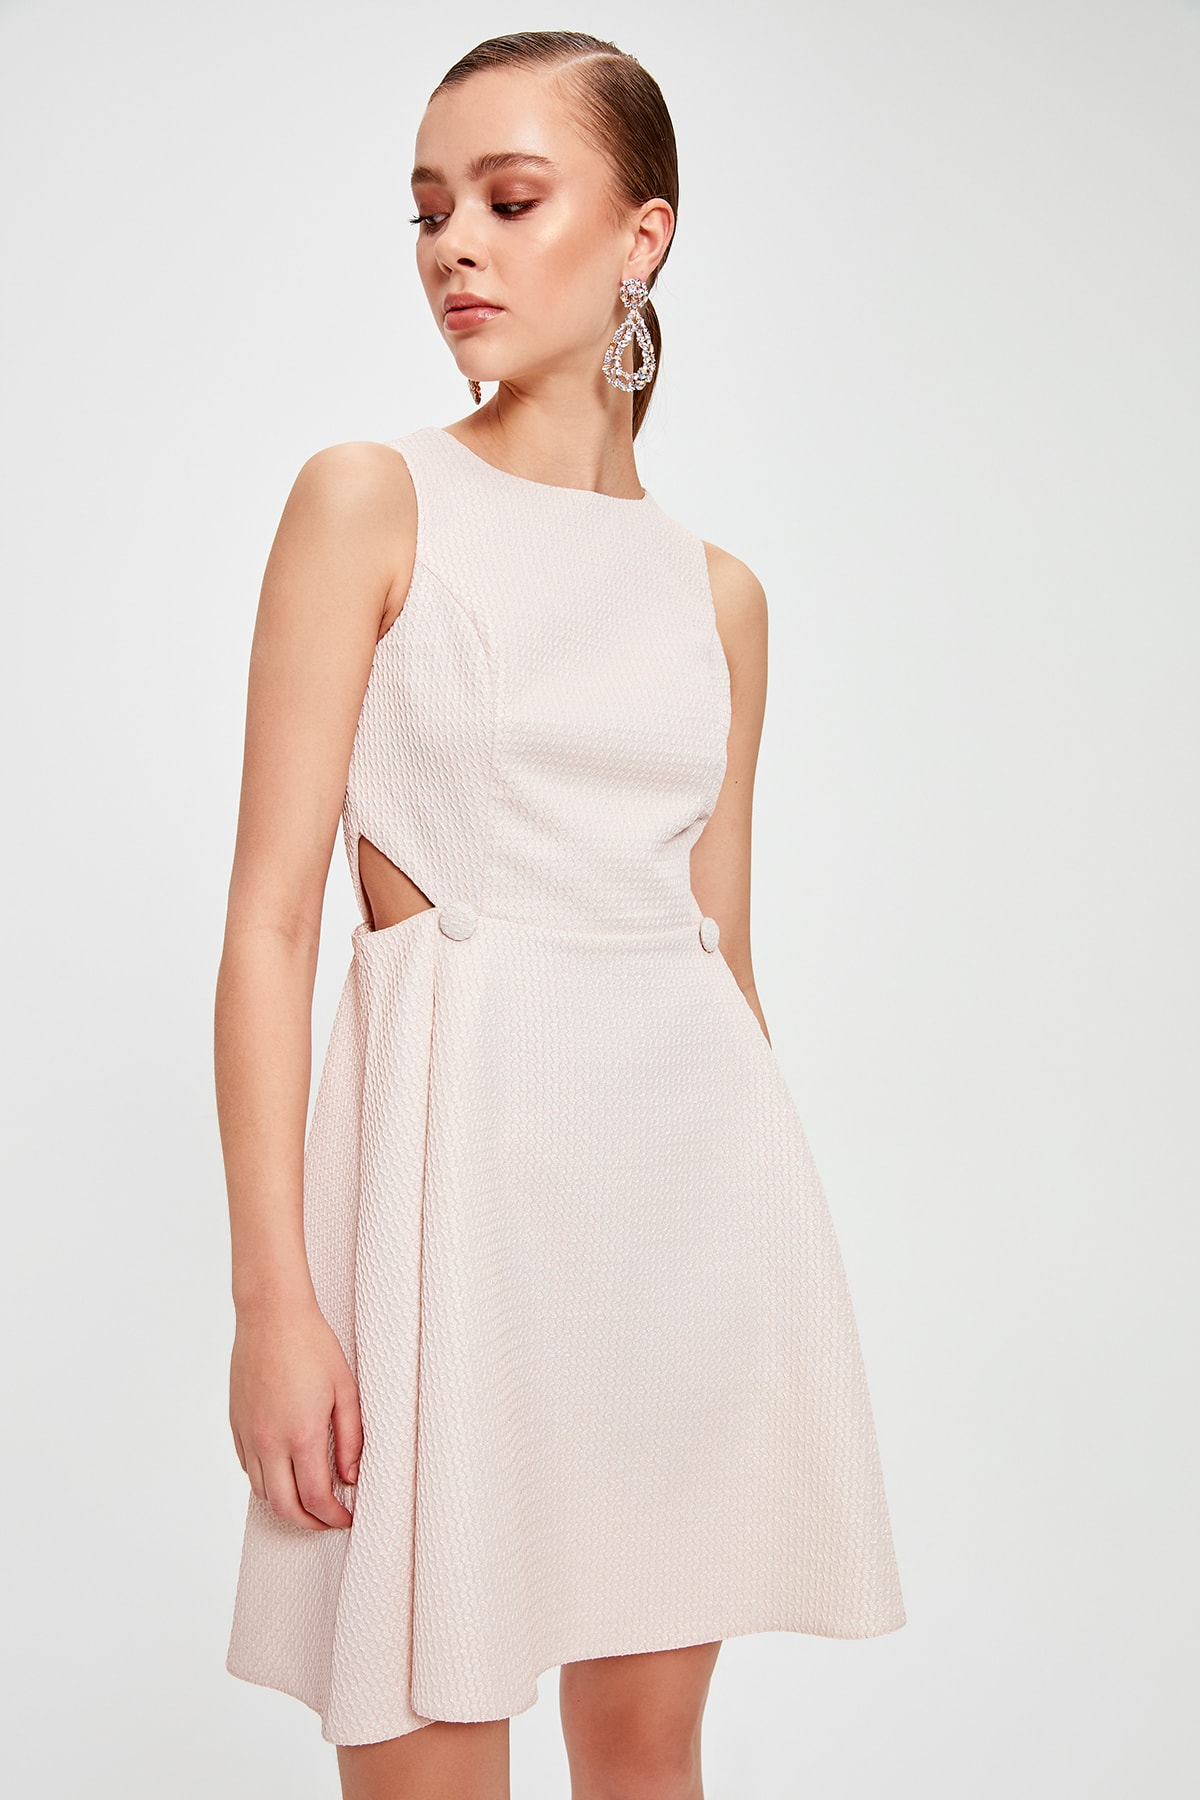 Trendyol Button Detail Dress TPRSS20EL0017